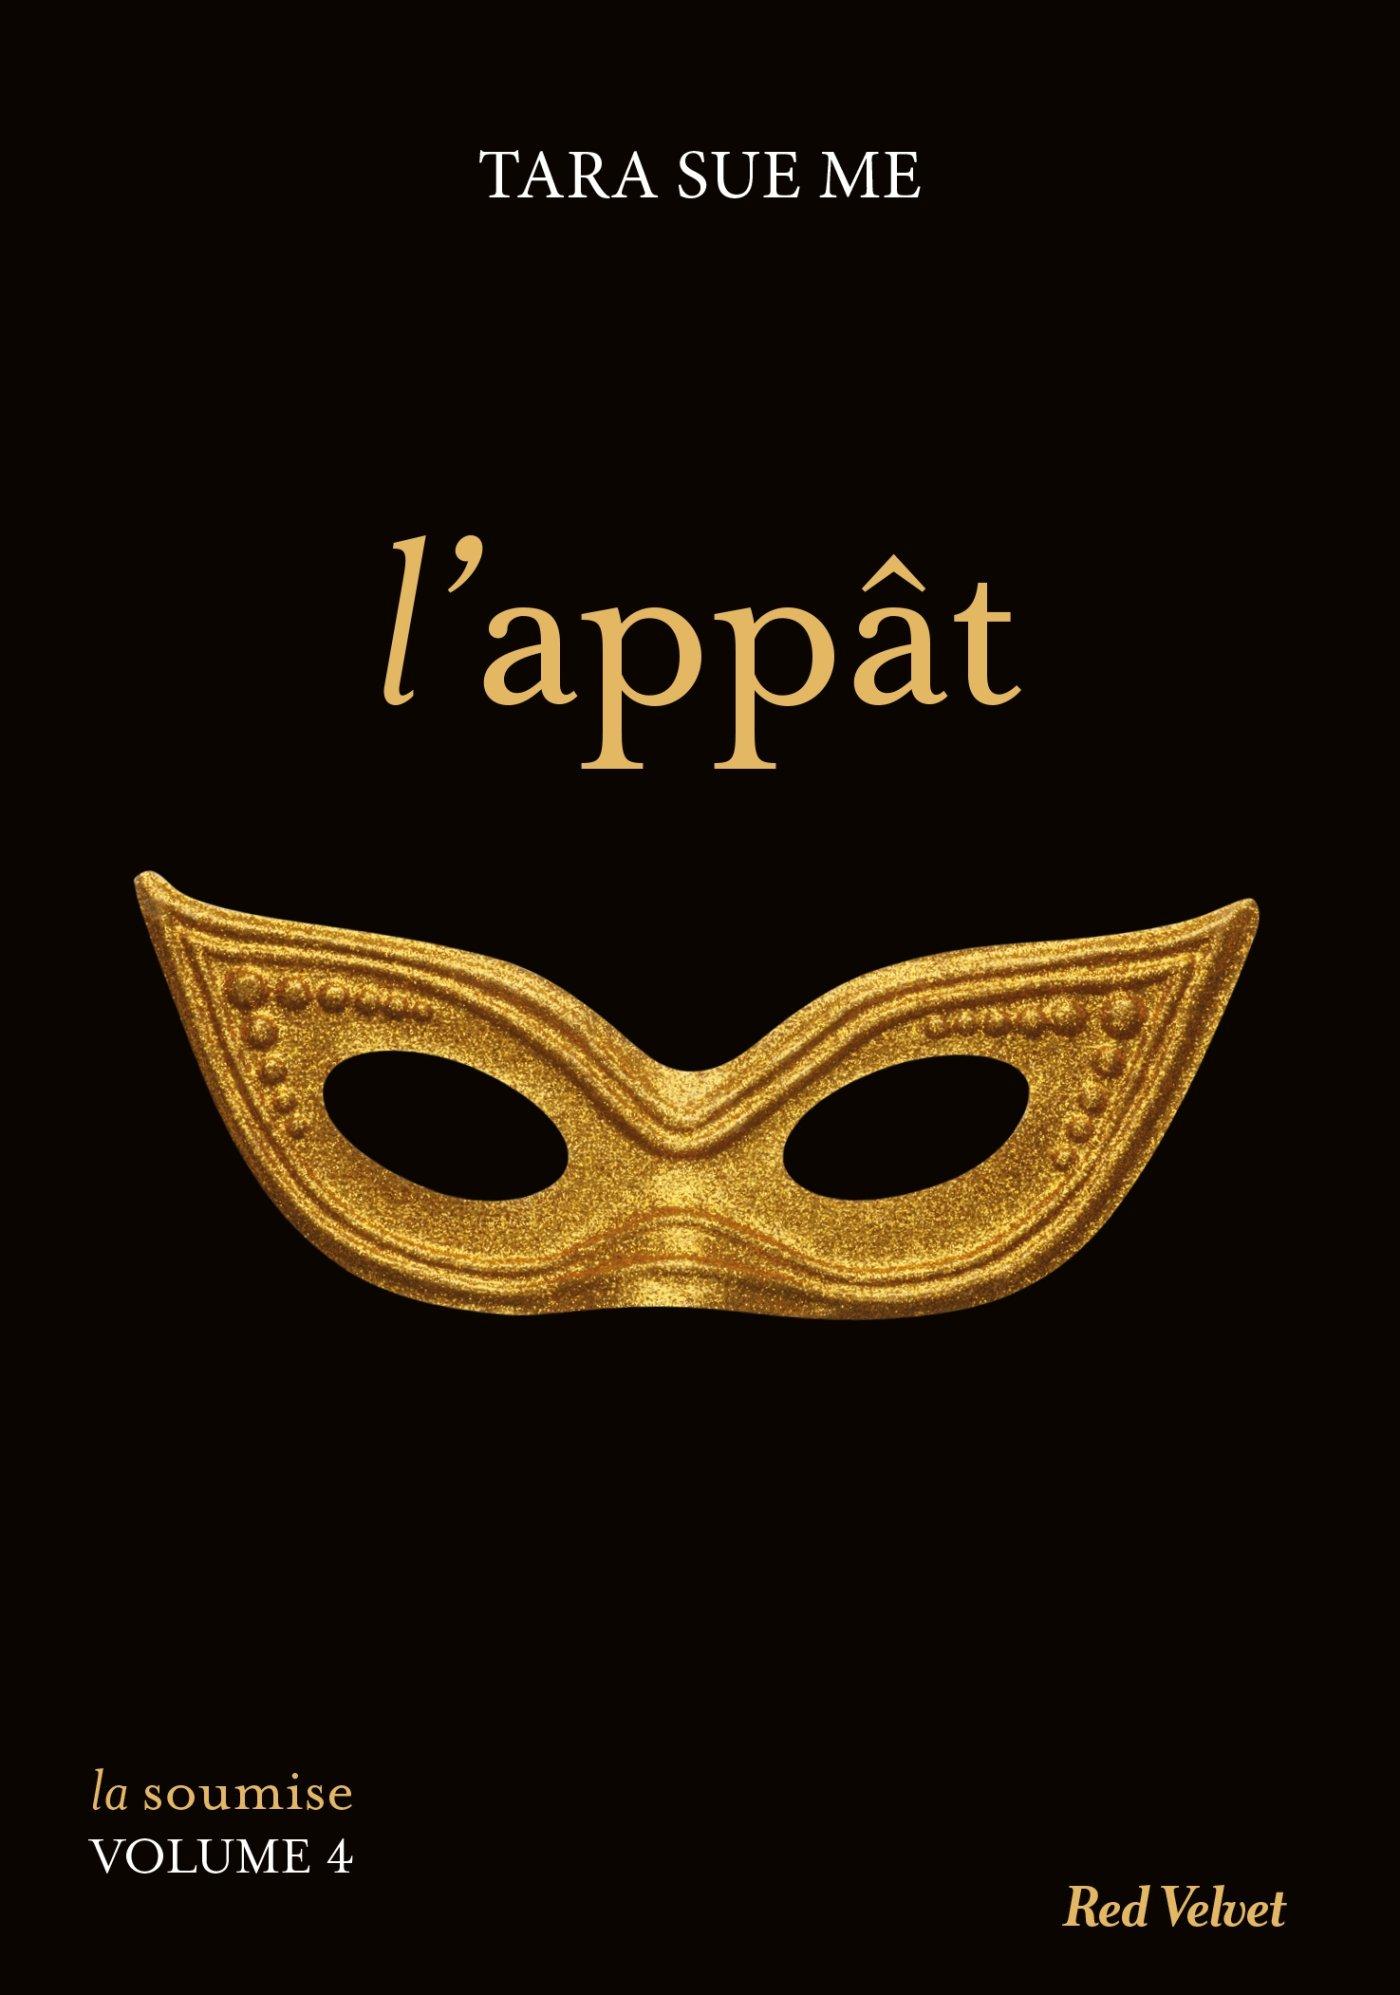 http://queenofreading1605.blogspot.be/2015/06/la-soumise-tome-4-lappat-de-tara-sue-me.html